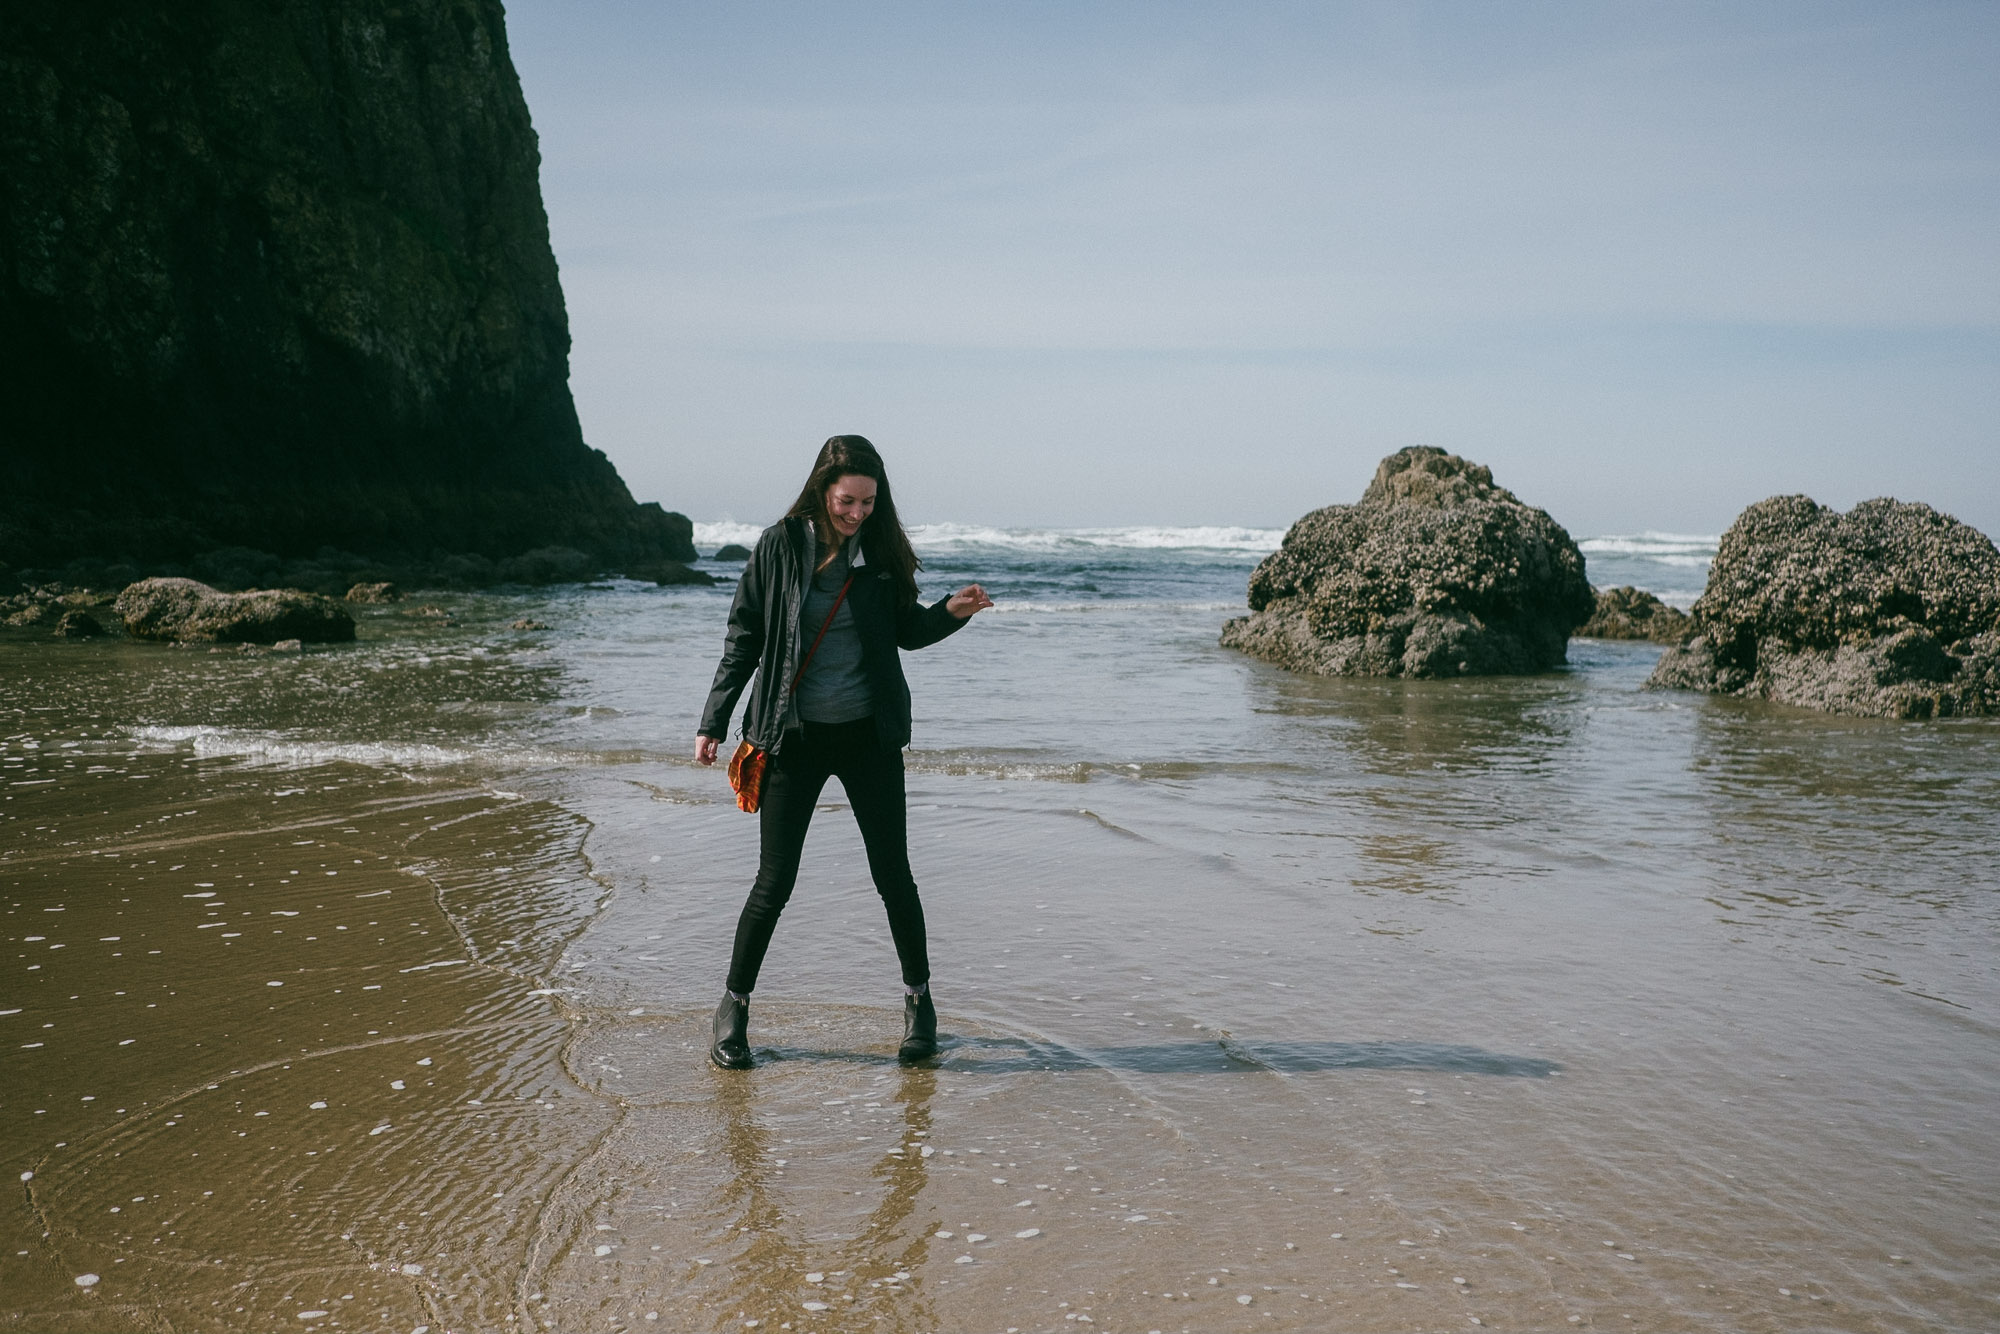 cannon-beach-fred